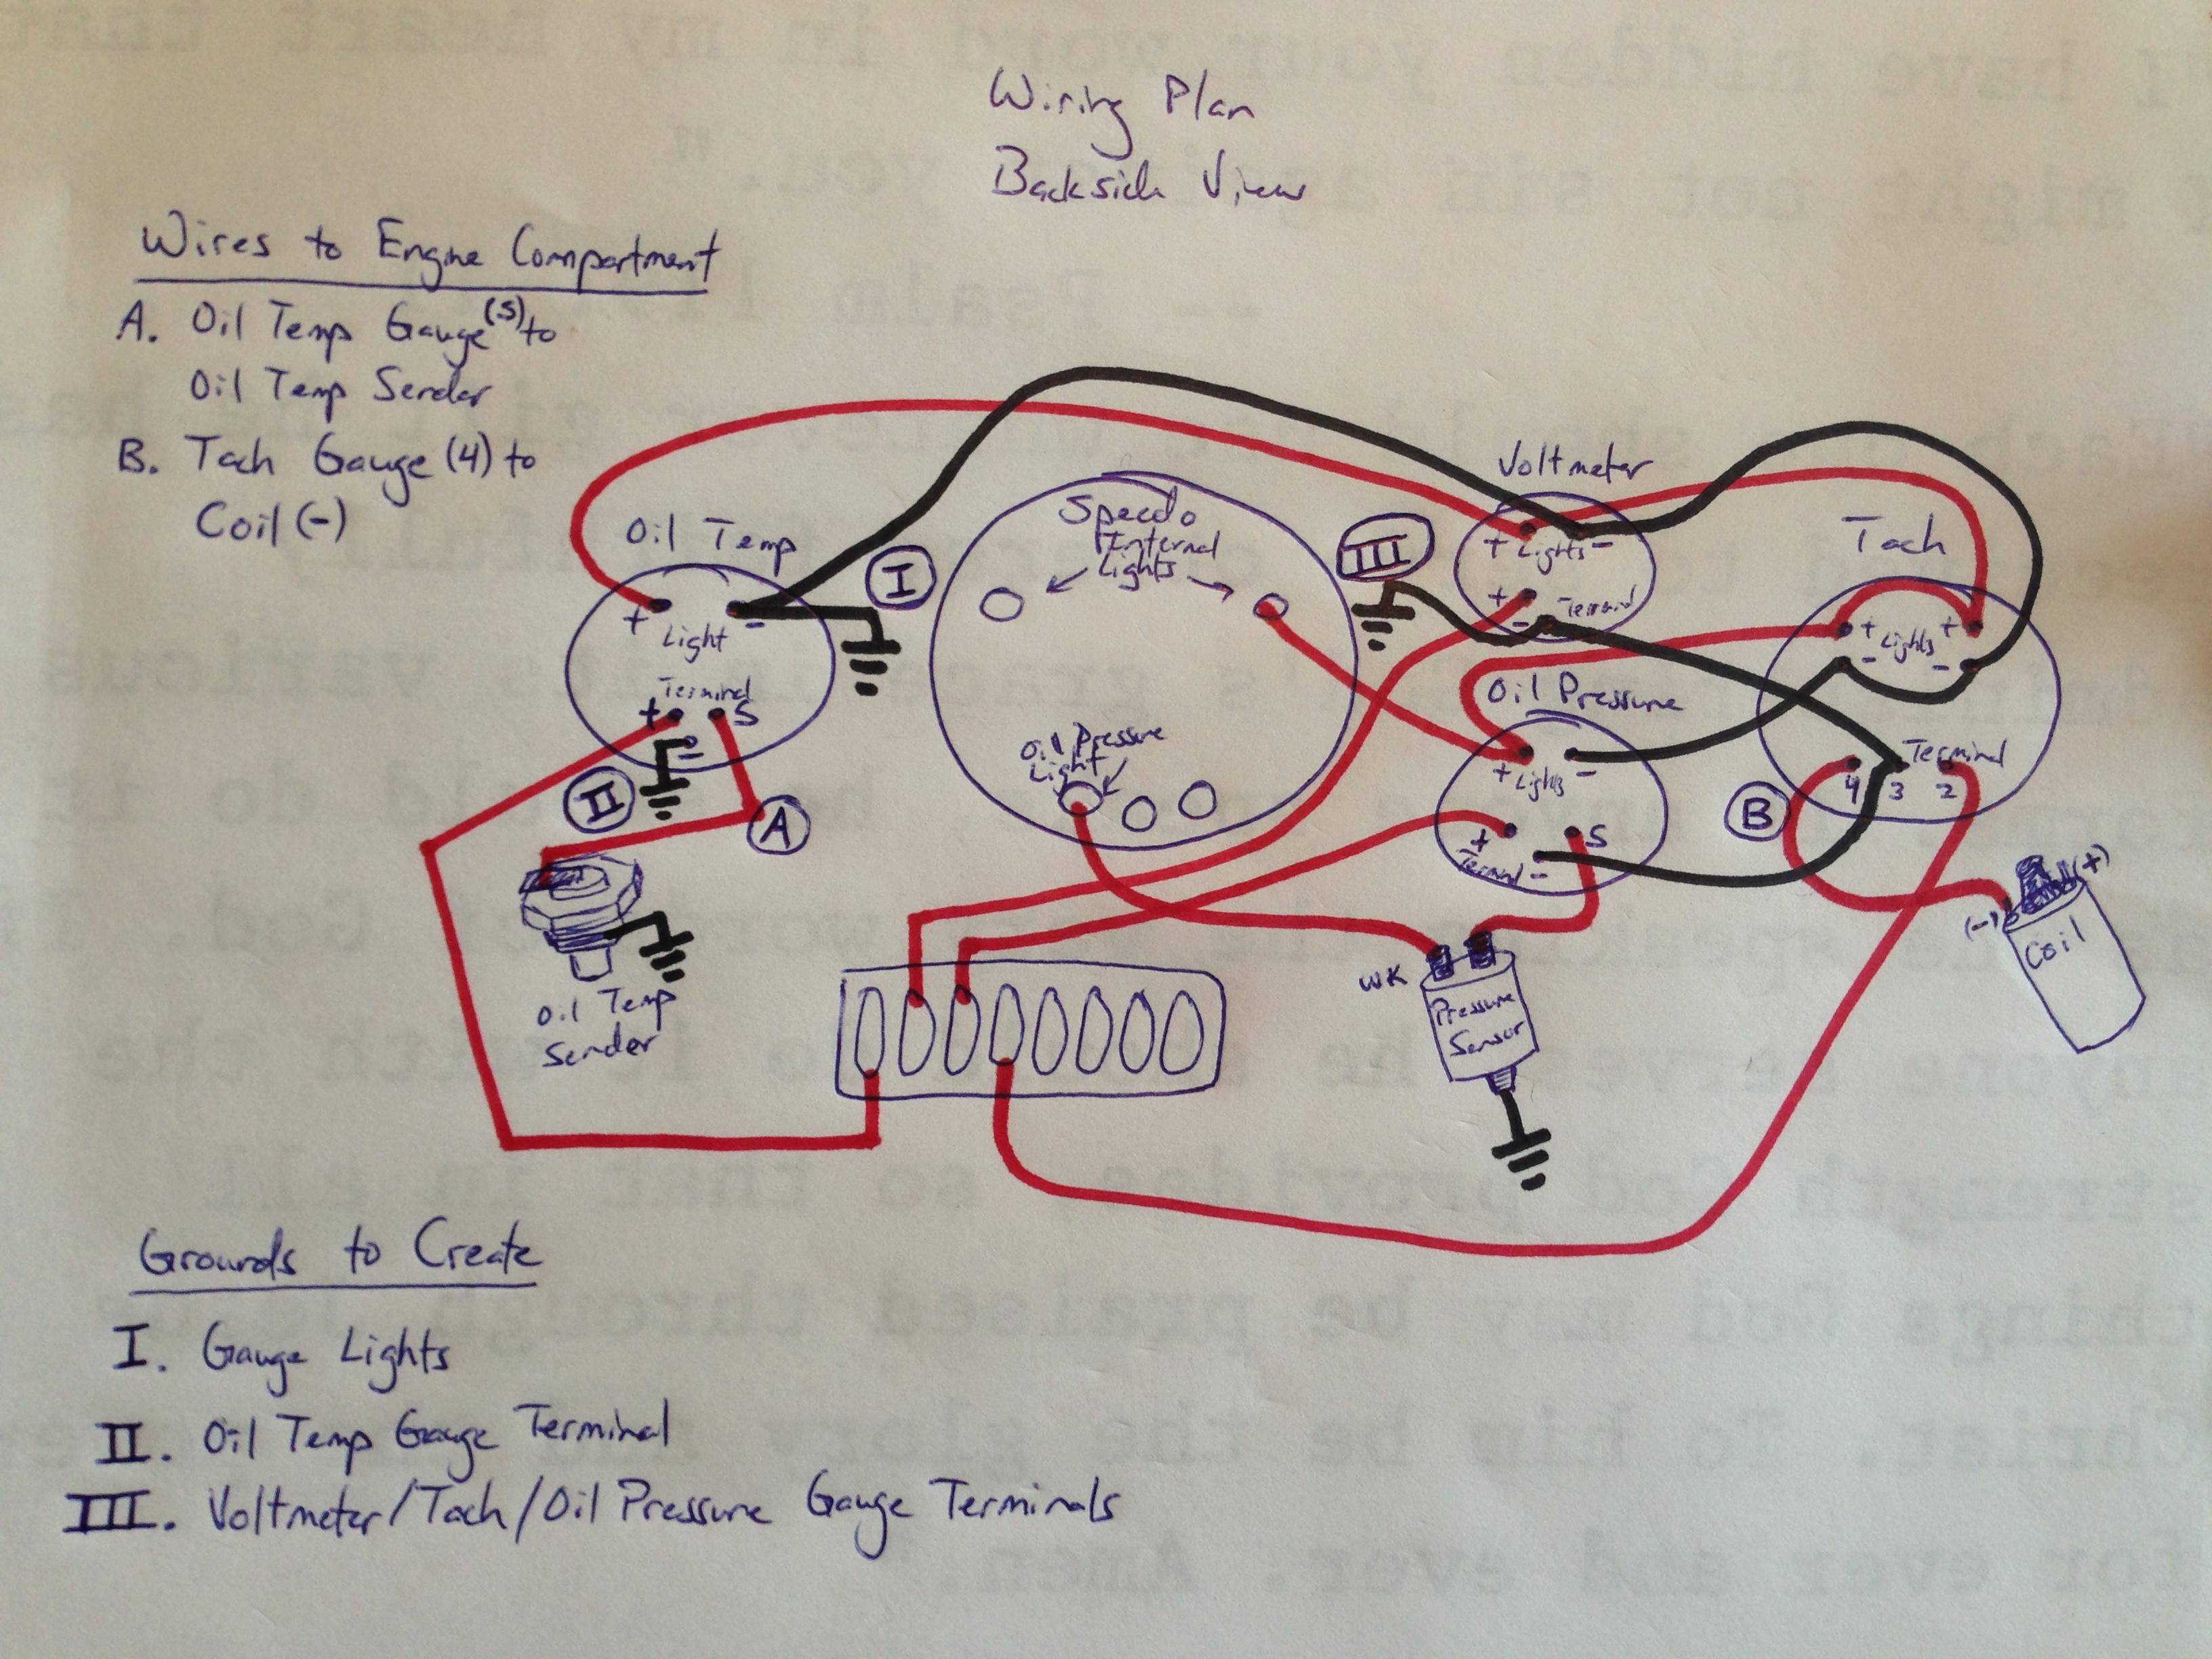 69 Vw Wiring Diagram Speedometer Wiring Diagrams Collection Collection Chatteriedelavalleedufelin Fr